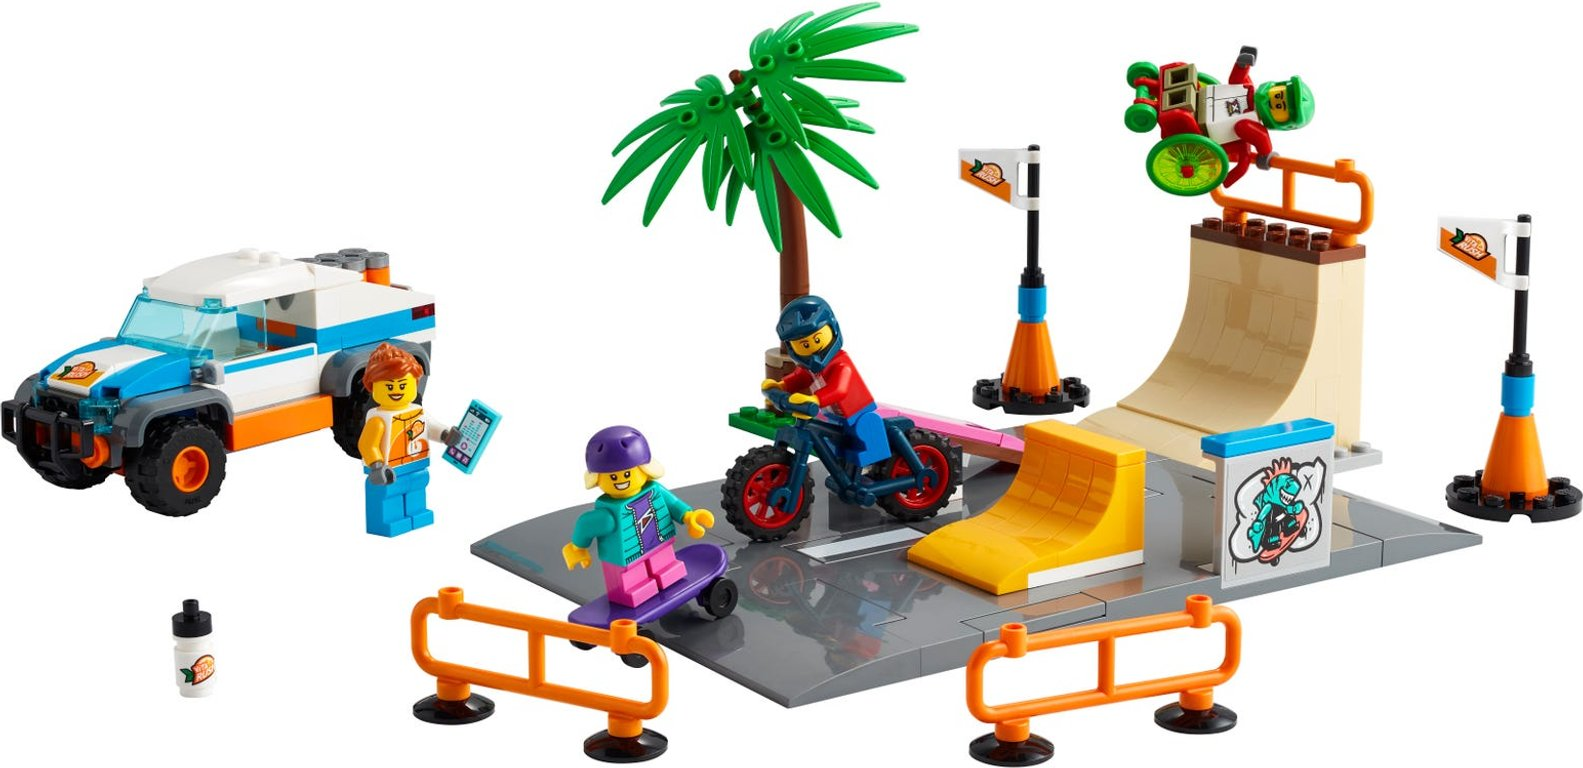 LEGO® City Skate Park components